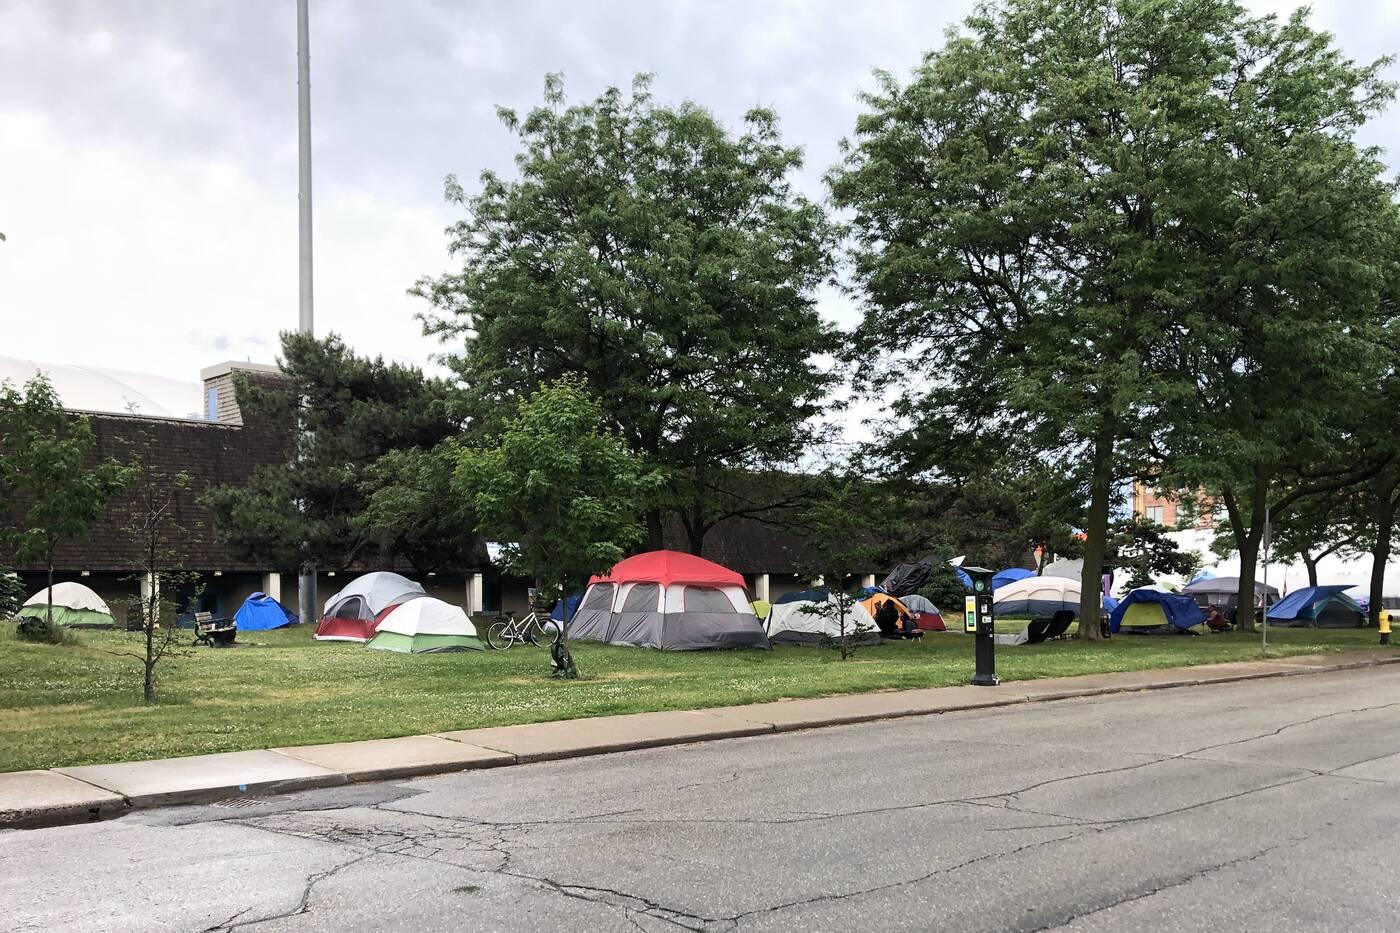 toronto homeless encampments